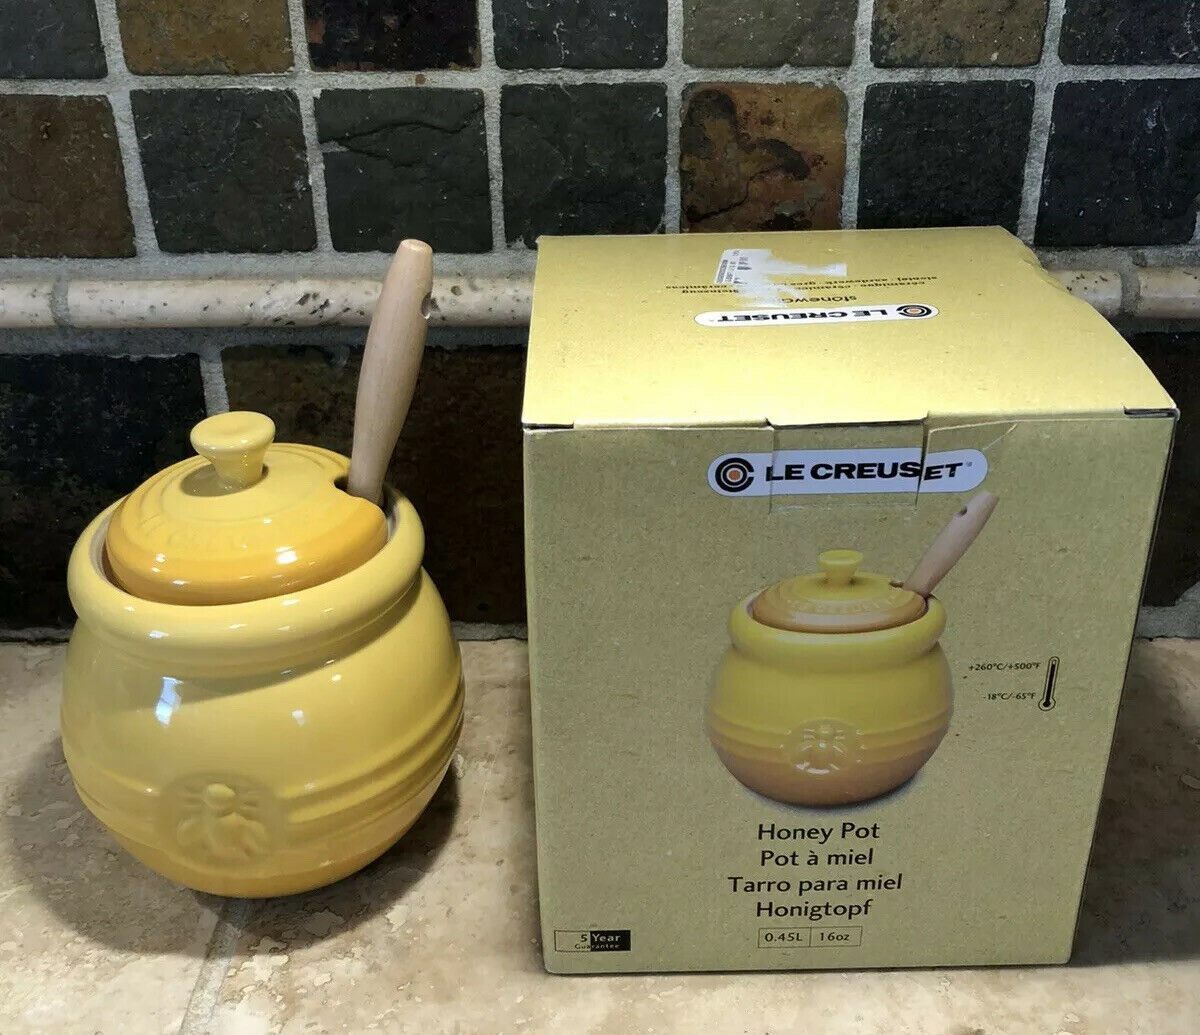 Honey Yellow 16 Oz Le Creuset Honey Pot Silicone Dip Stick Nwt Condiment For Sale Online